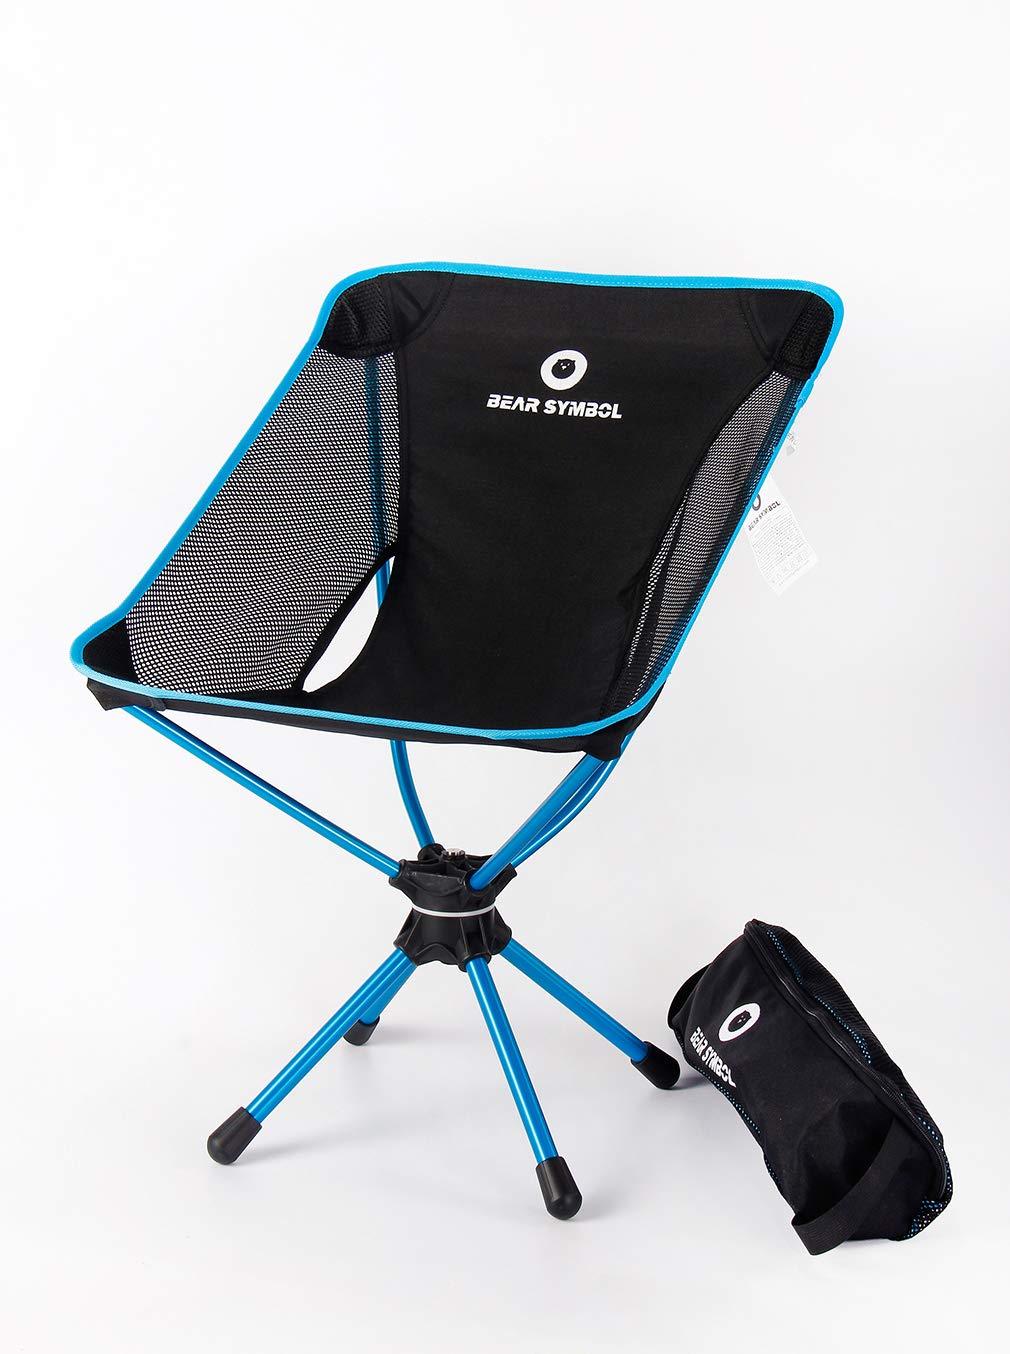 DUBAOBAO Camping Stuhl Portable Outdoor Ultralight Camping BBQ Stuhl Angeln Stuhl Outdoor Klappstuhl + Luftfahrt Grade 7075 Aluminiumlegierung Material